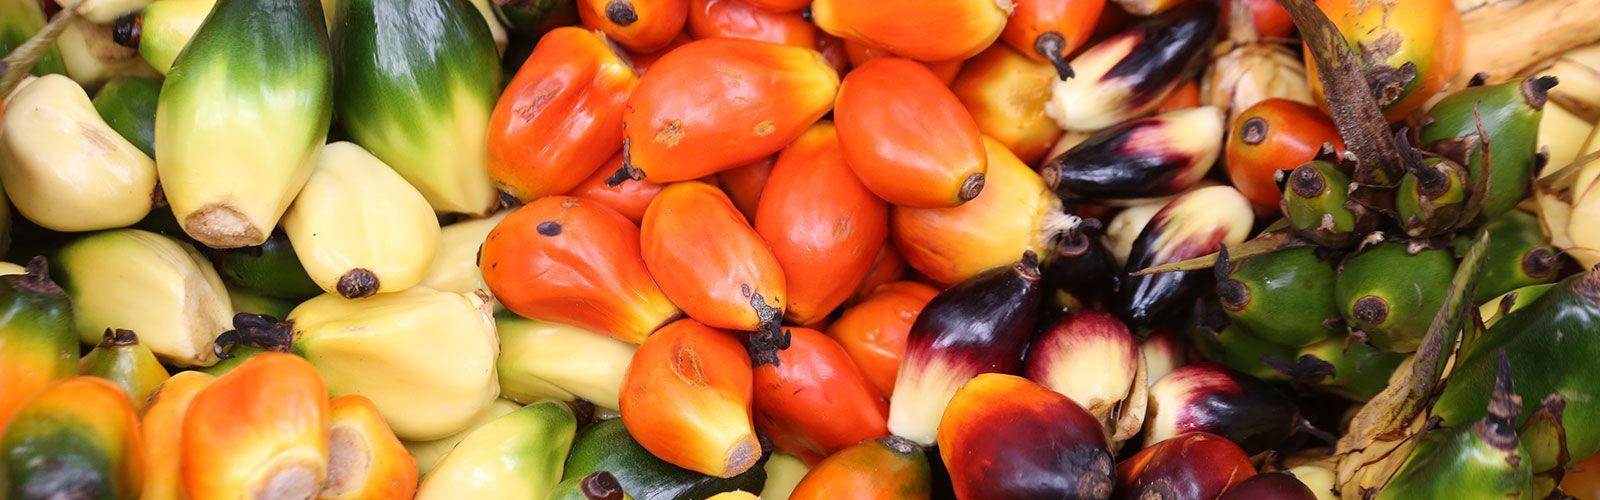 Palmier à huile © A. Rival, Cirad